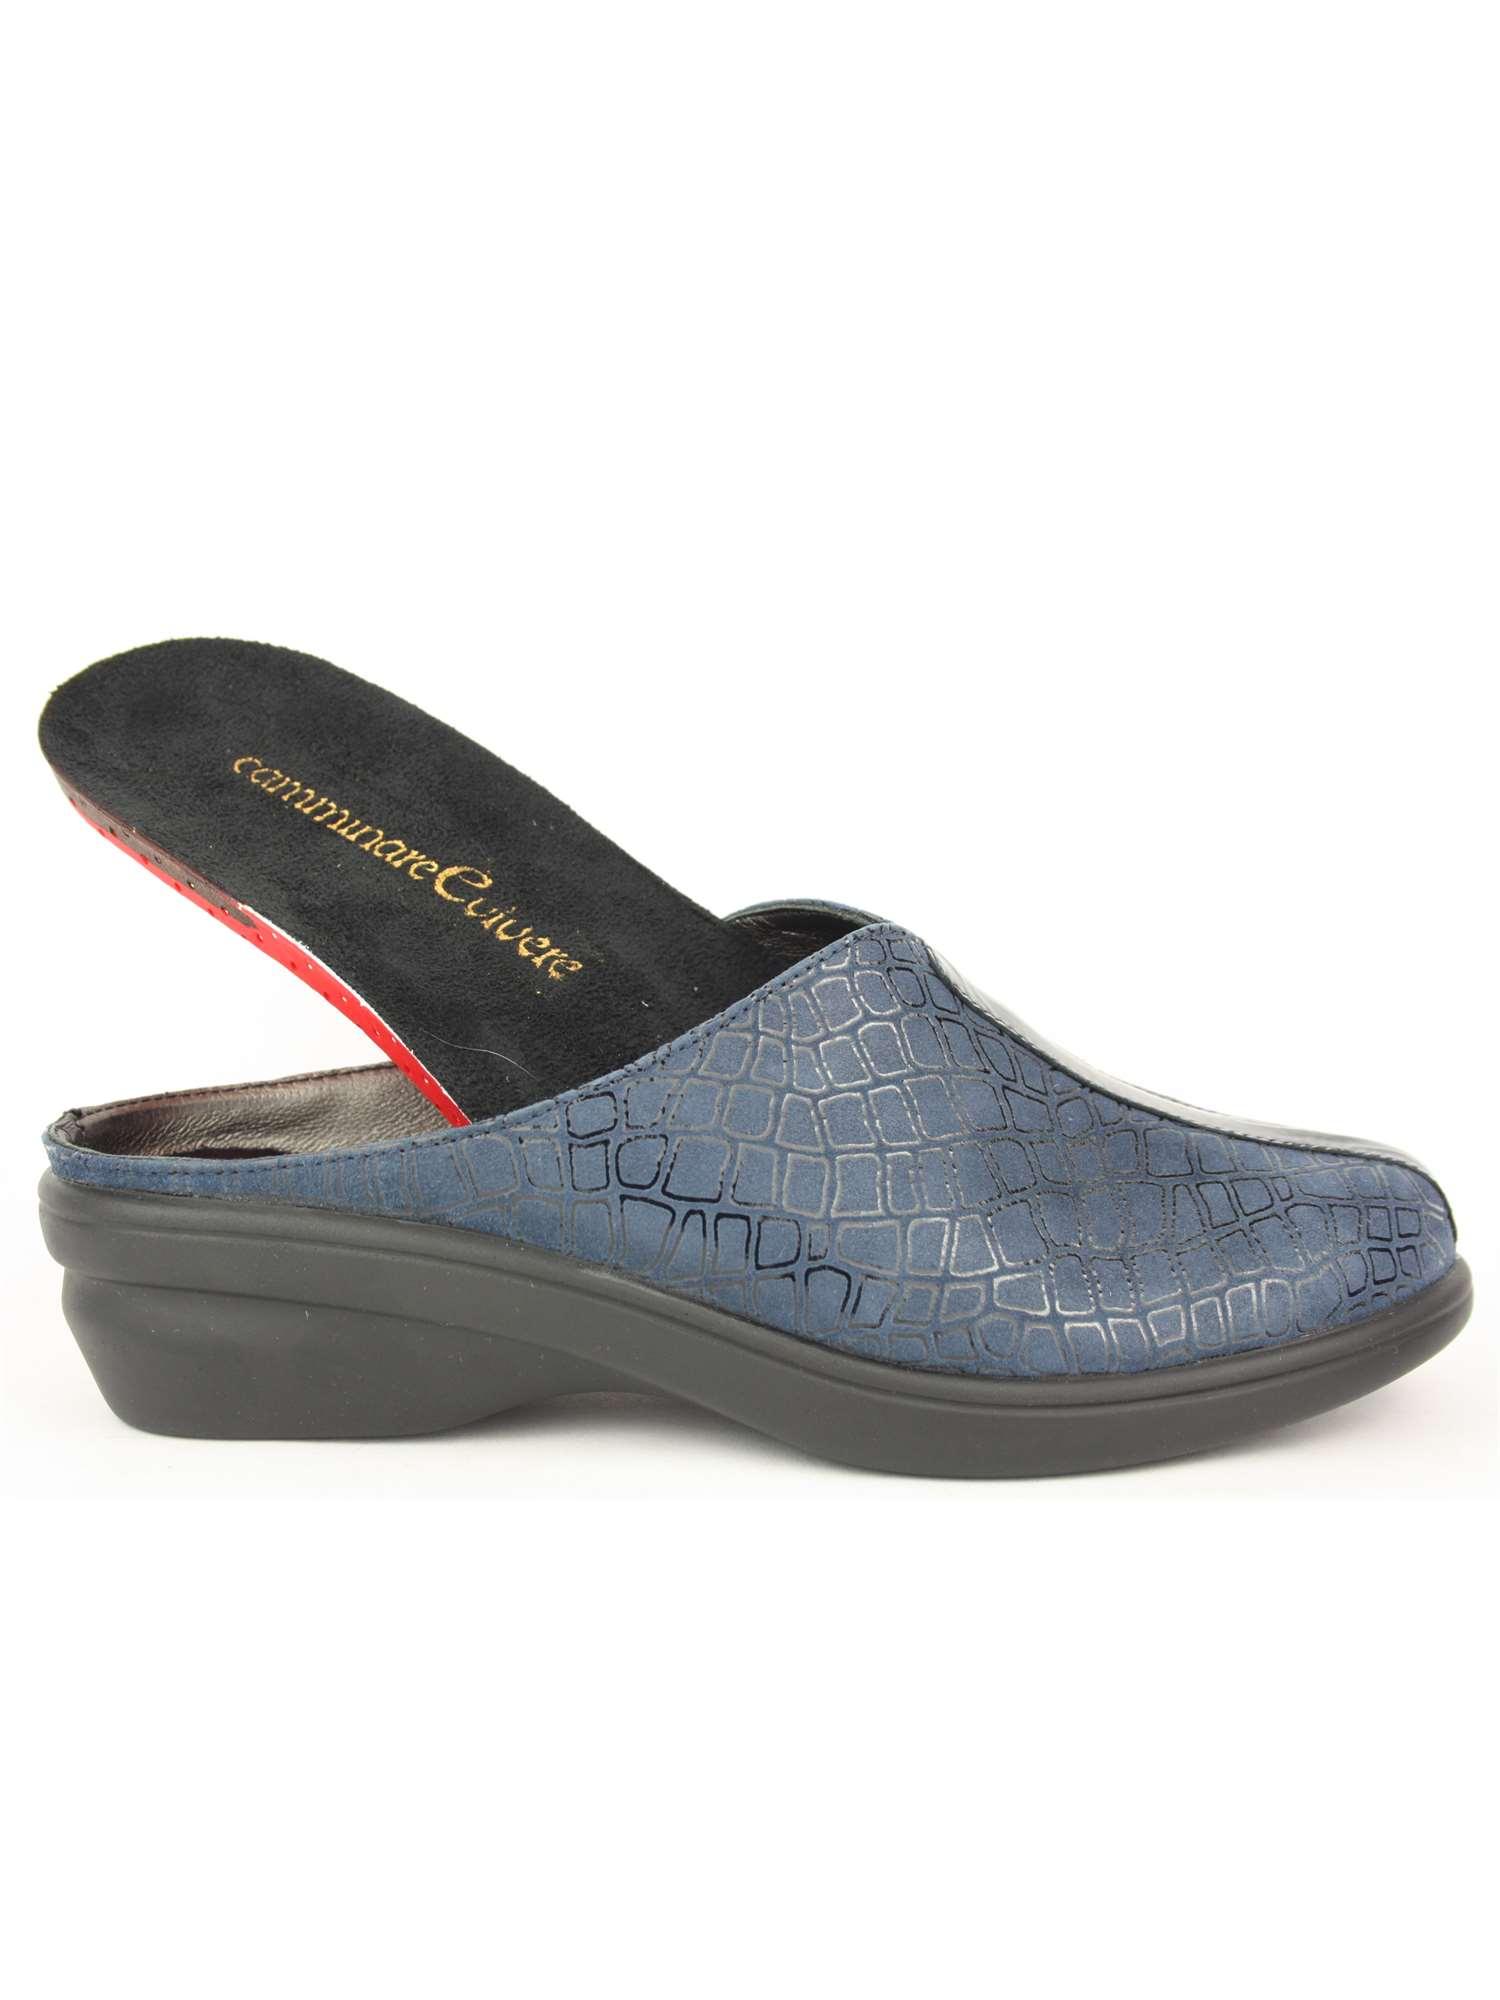 Fratelli Tomasi Pantofola Punta Chiusa Blu  a2faa69b523